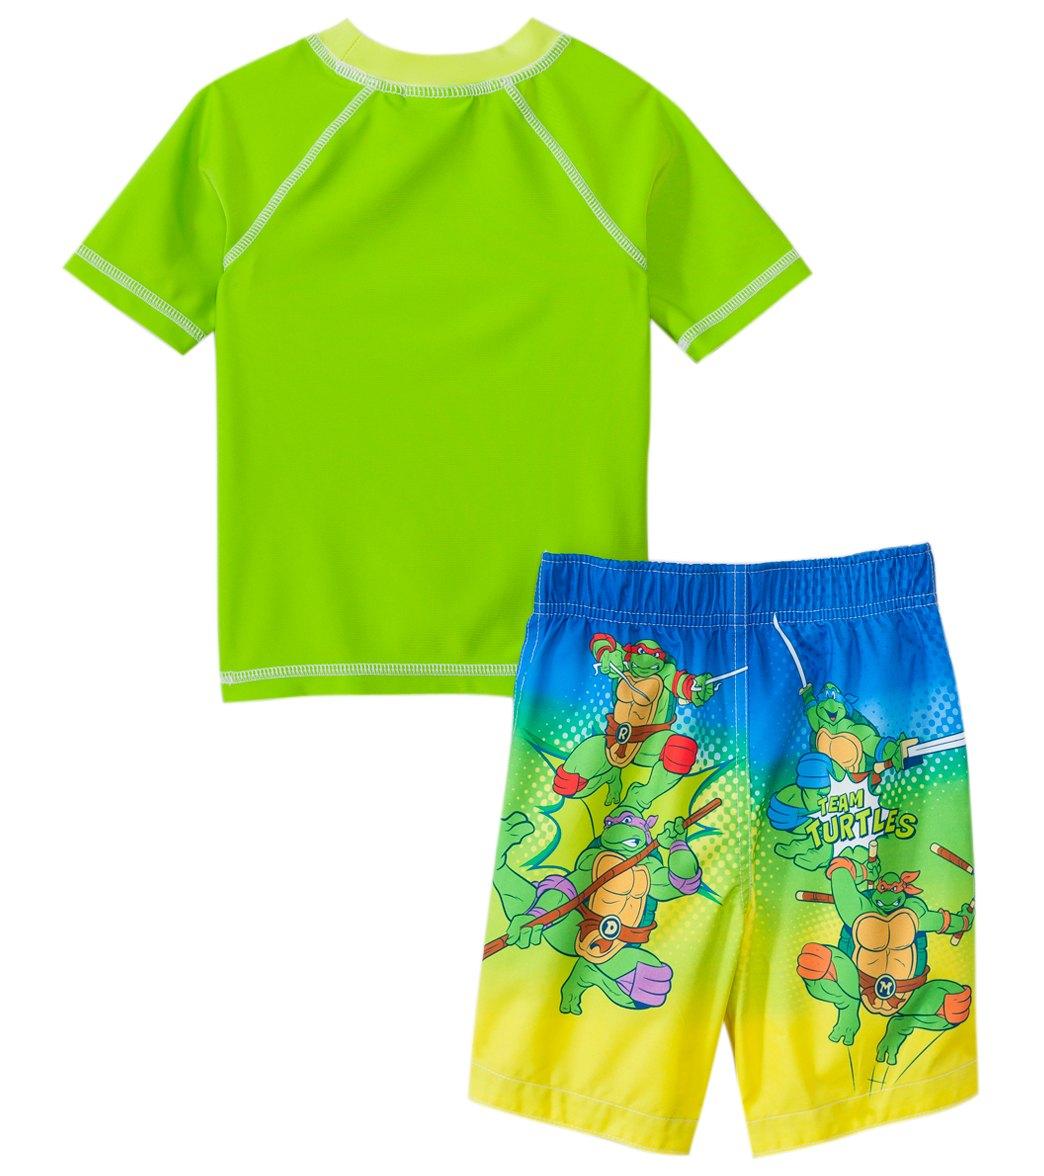 c9b5edccd7 Nickelodeon Boys' Teenage Mutant Ninja Turtles Swim Trunks & Rashguard Set  ...